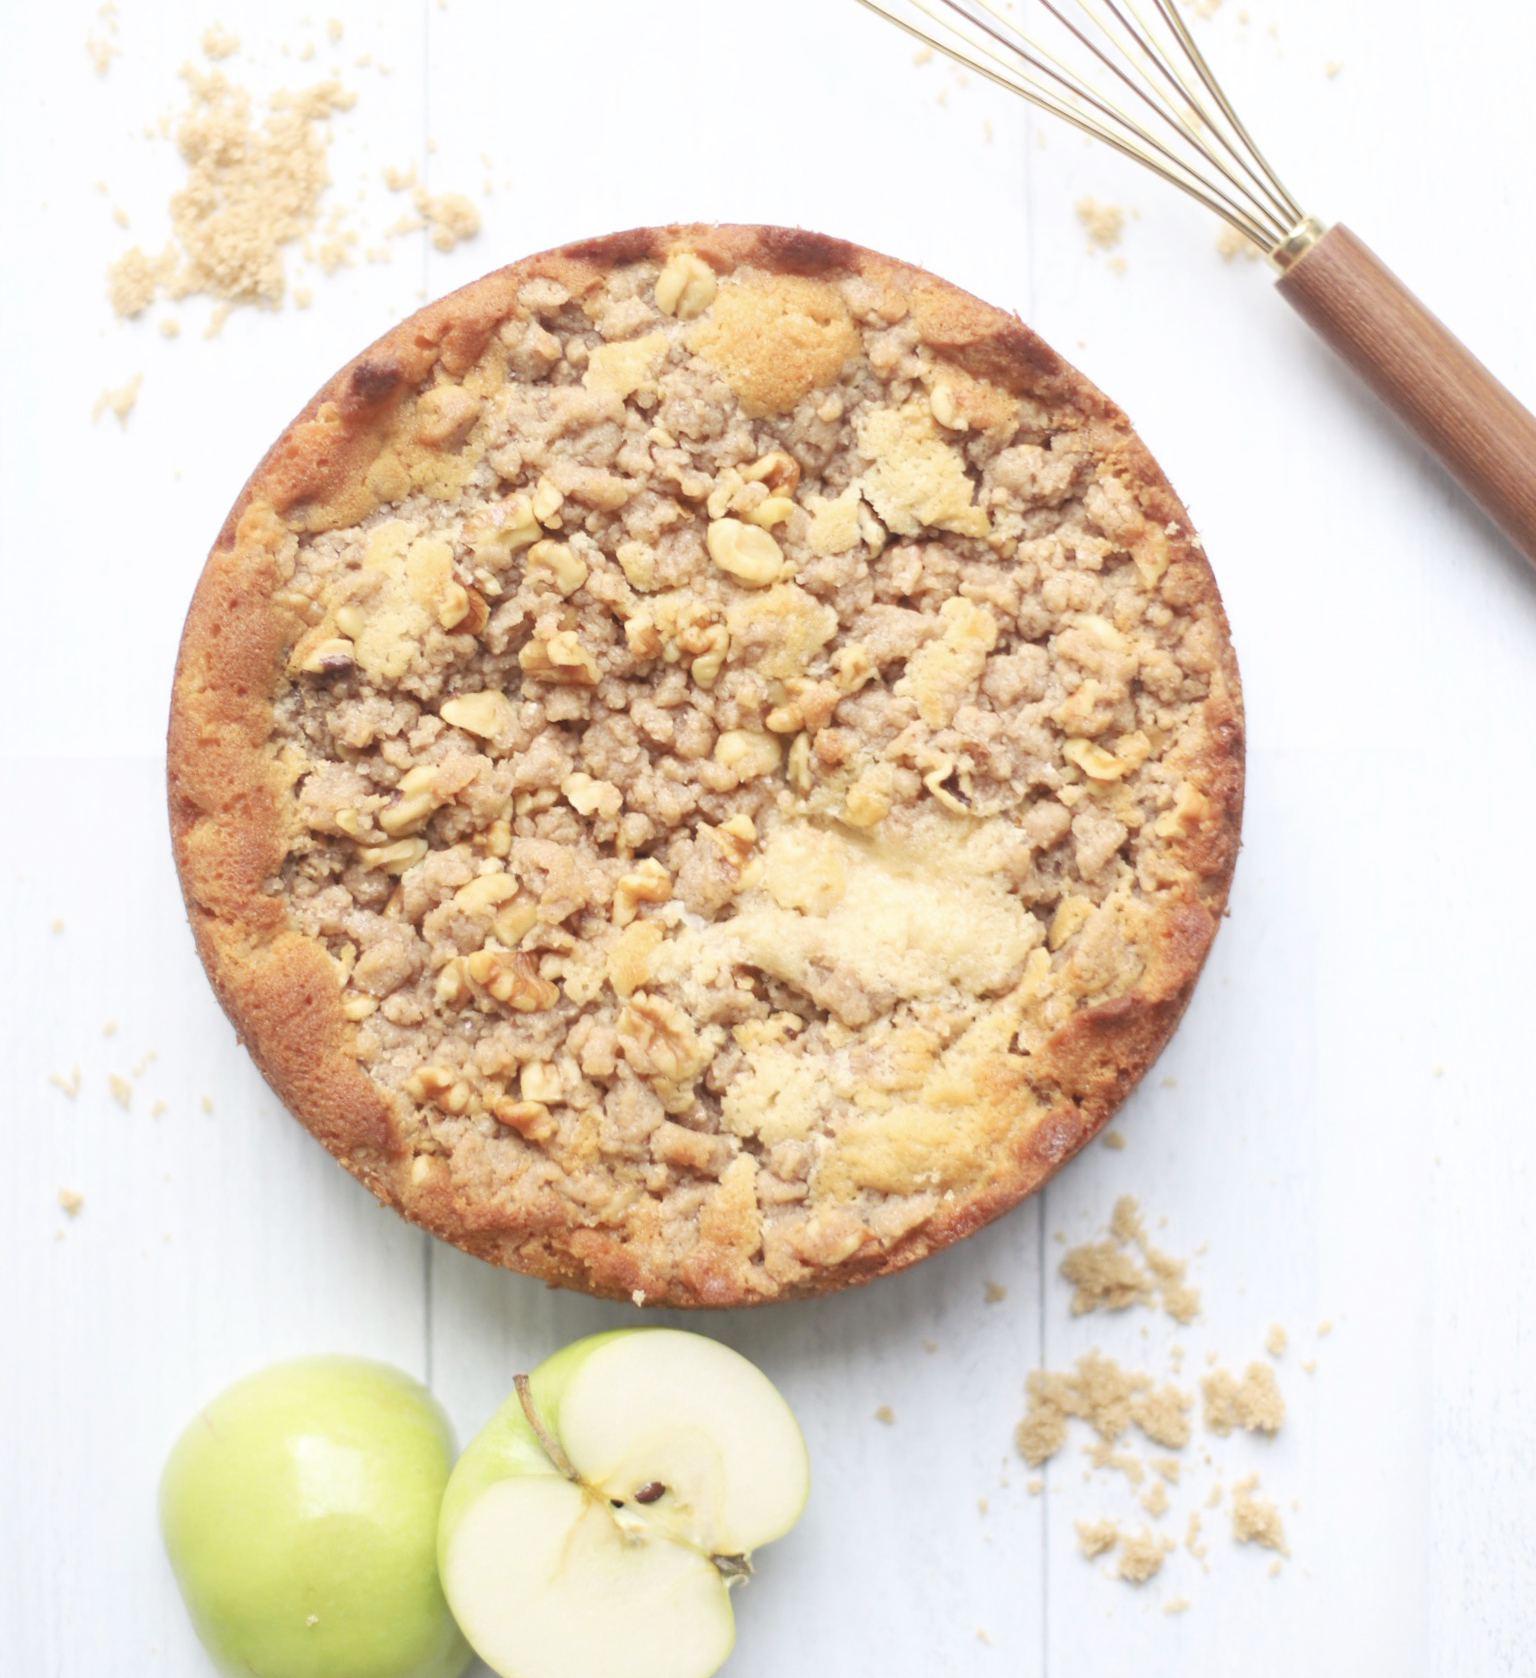 apple crumb cake with cinnamon sugar